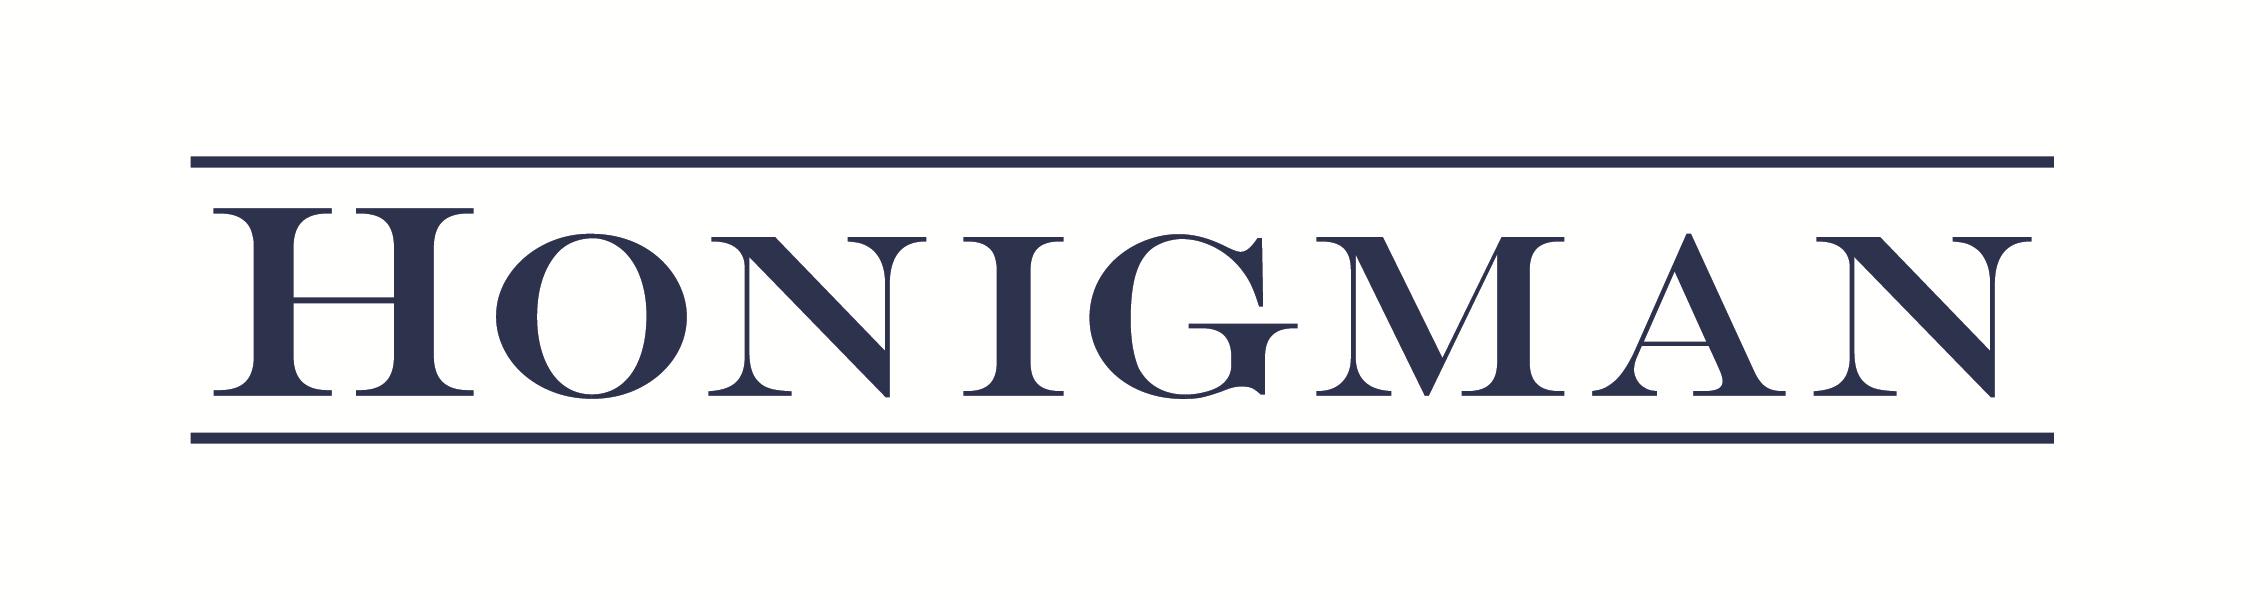 Honigman LLP logo